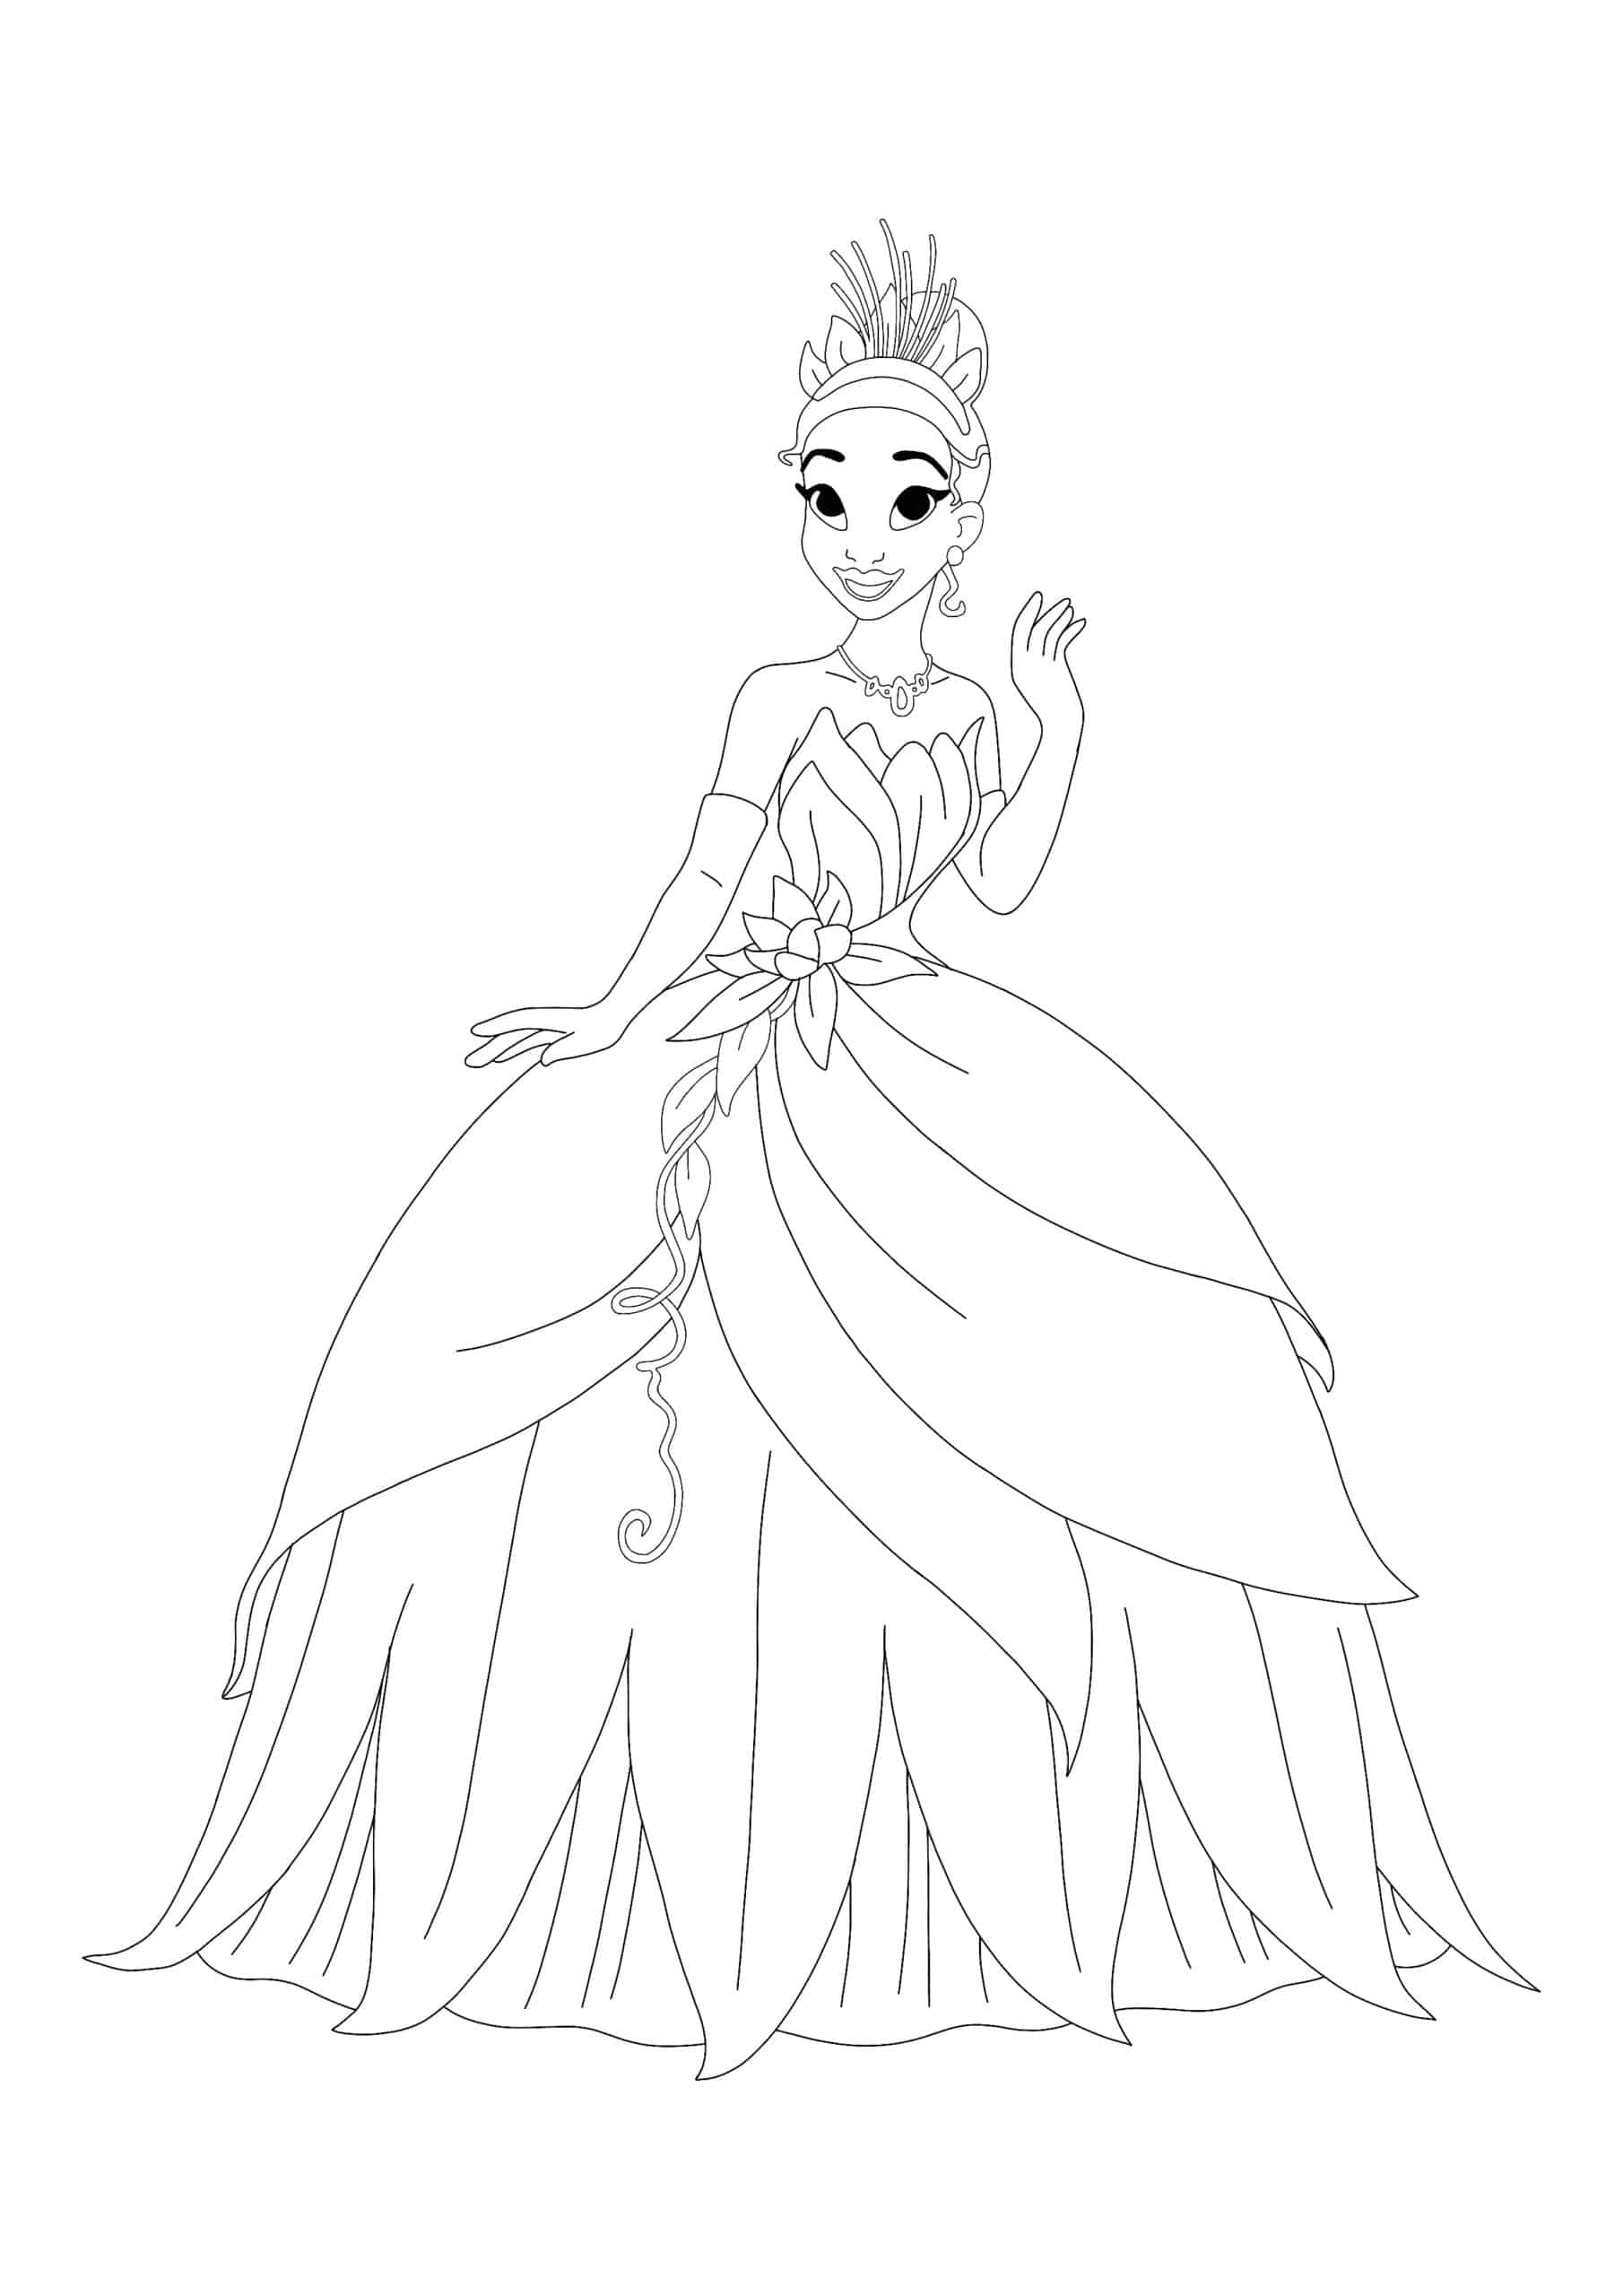 Princess Tiana coloring page